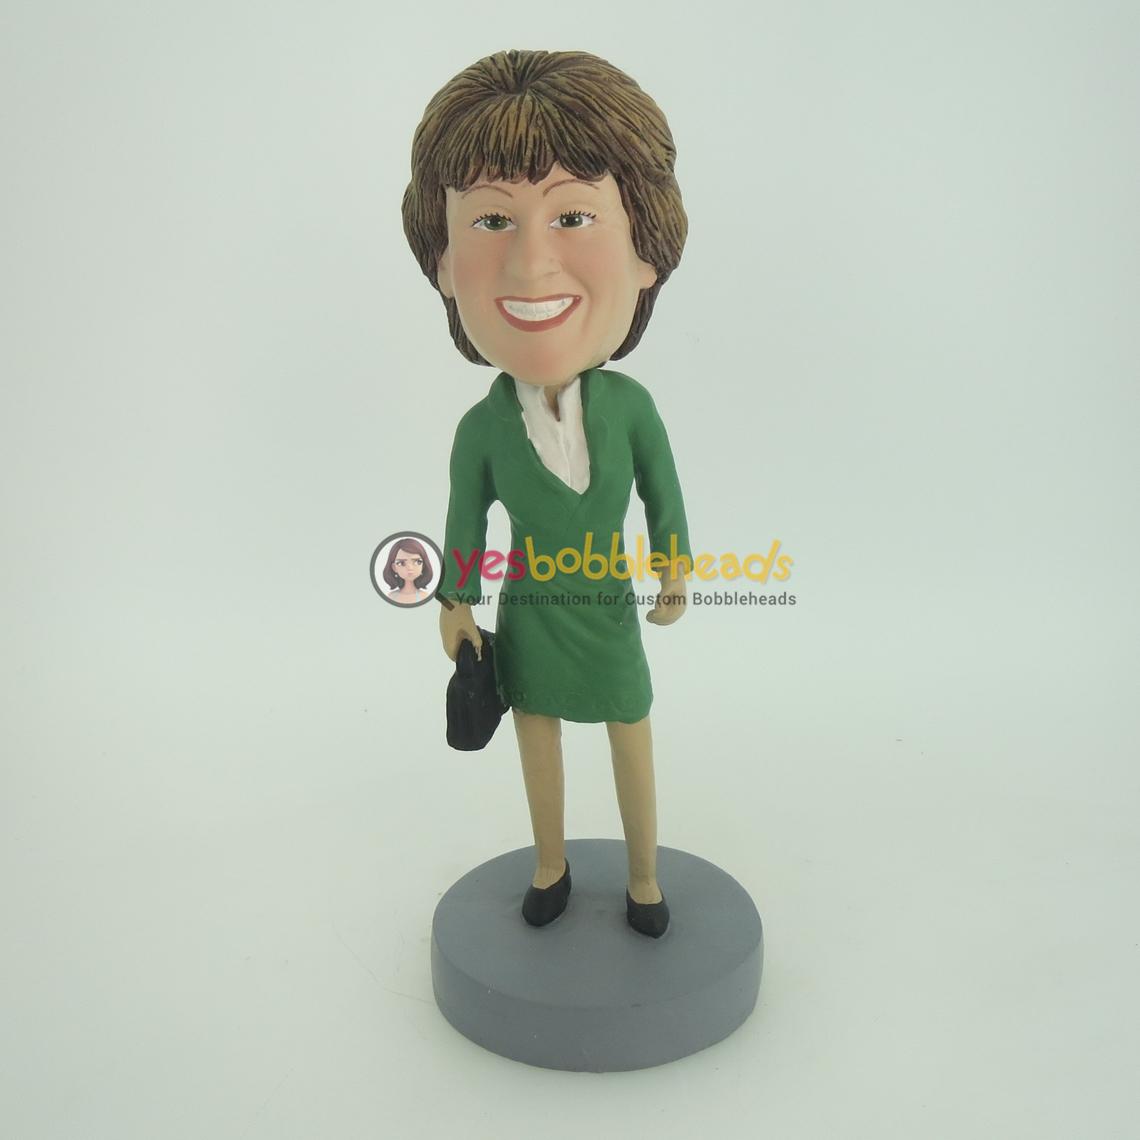 Picture of Custom Bobblehead Doll: Green Dress Woman